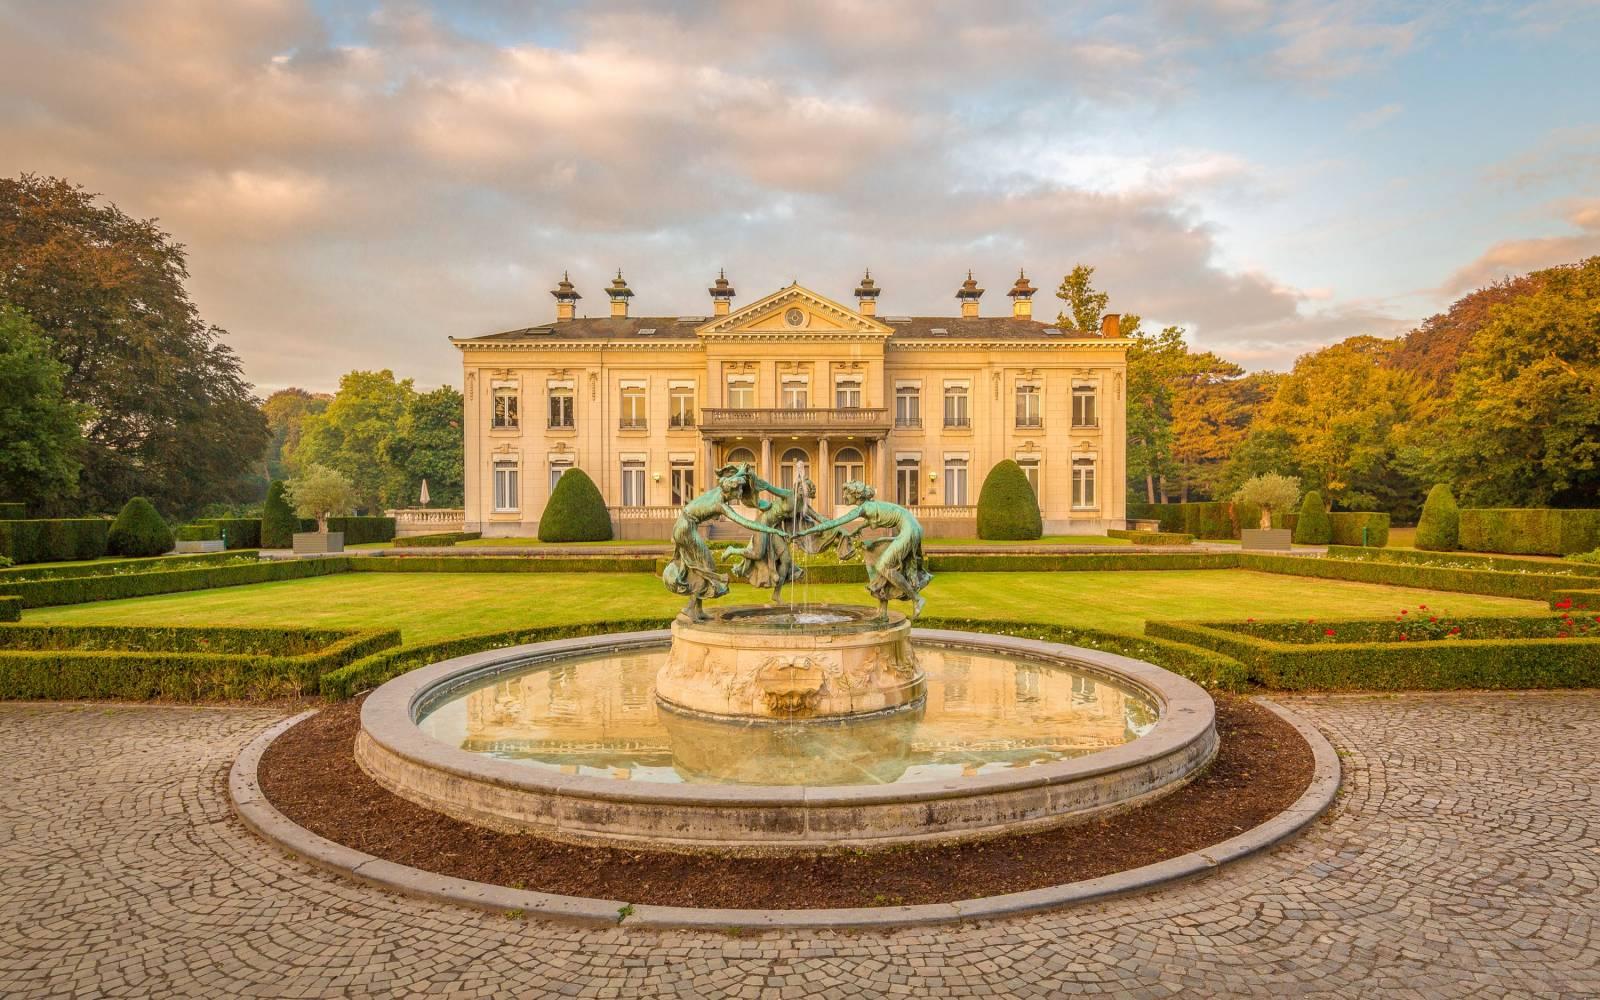 Kasteel Den Brandt - Feestzaal - Trouwzaal - Kasteel - House of Weddings - 39